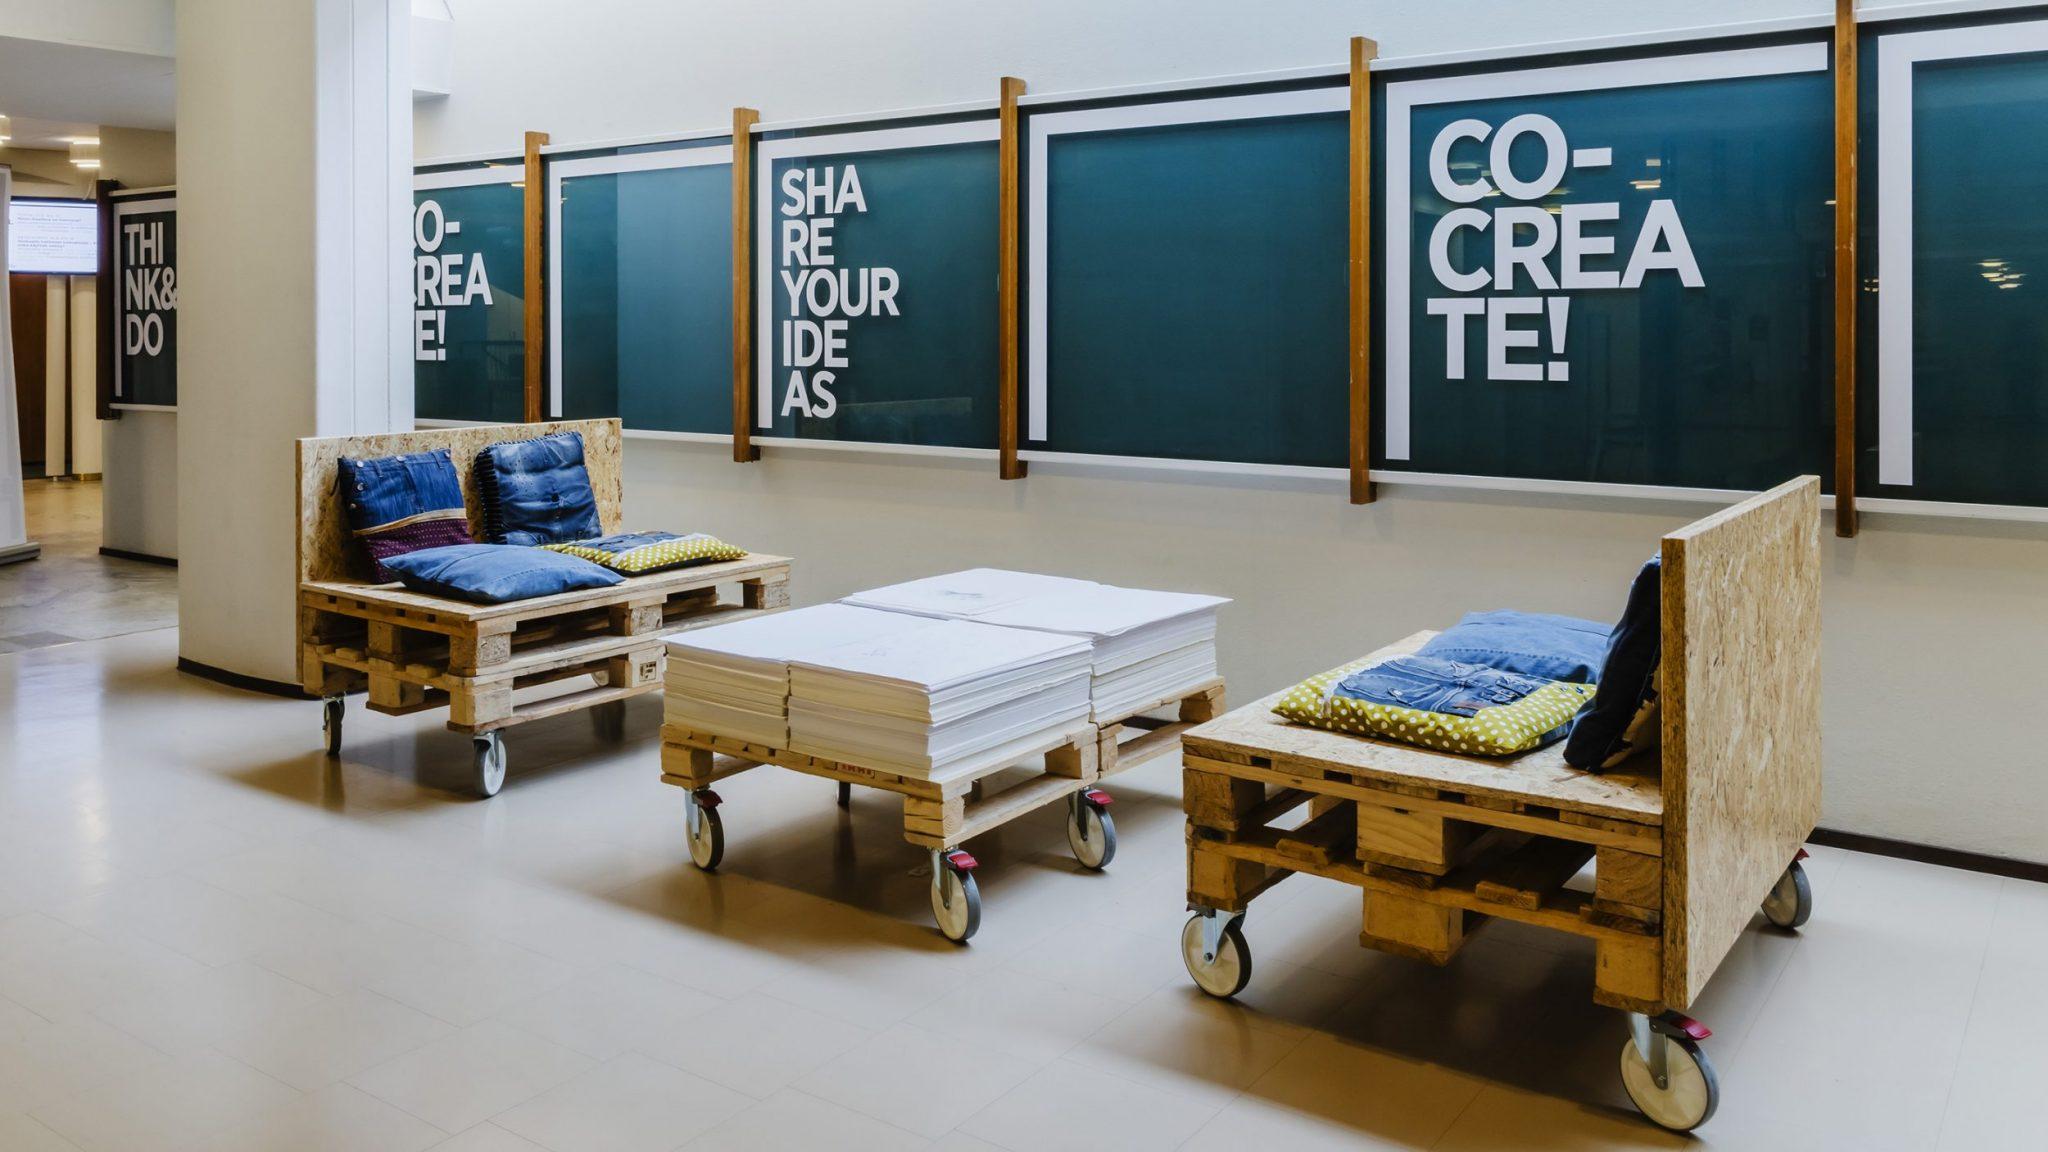 Think-Corner-pop-up-store-Aleksanterinkatu-Helsinki-GI-Project-2